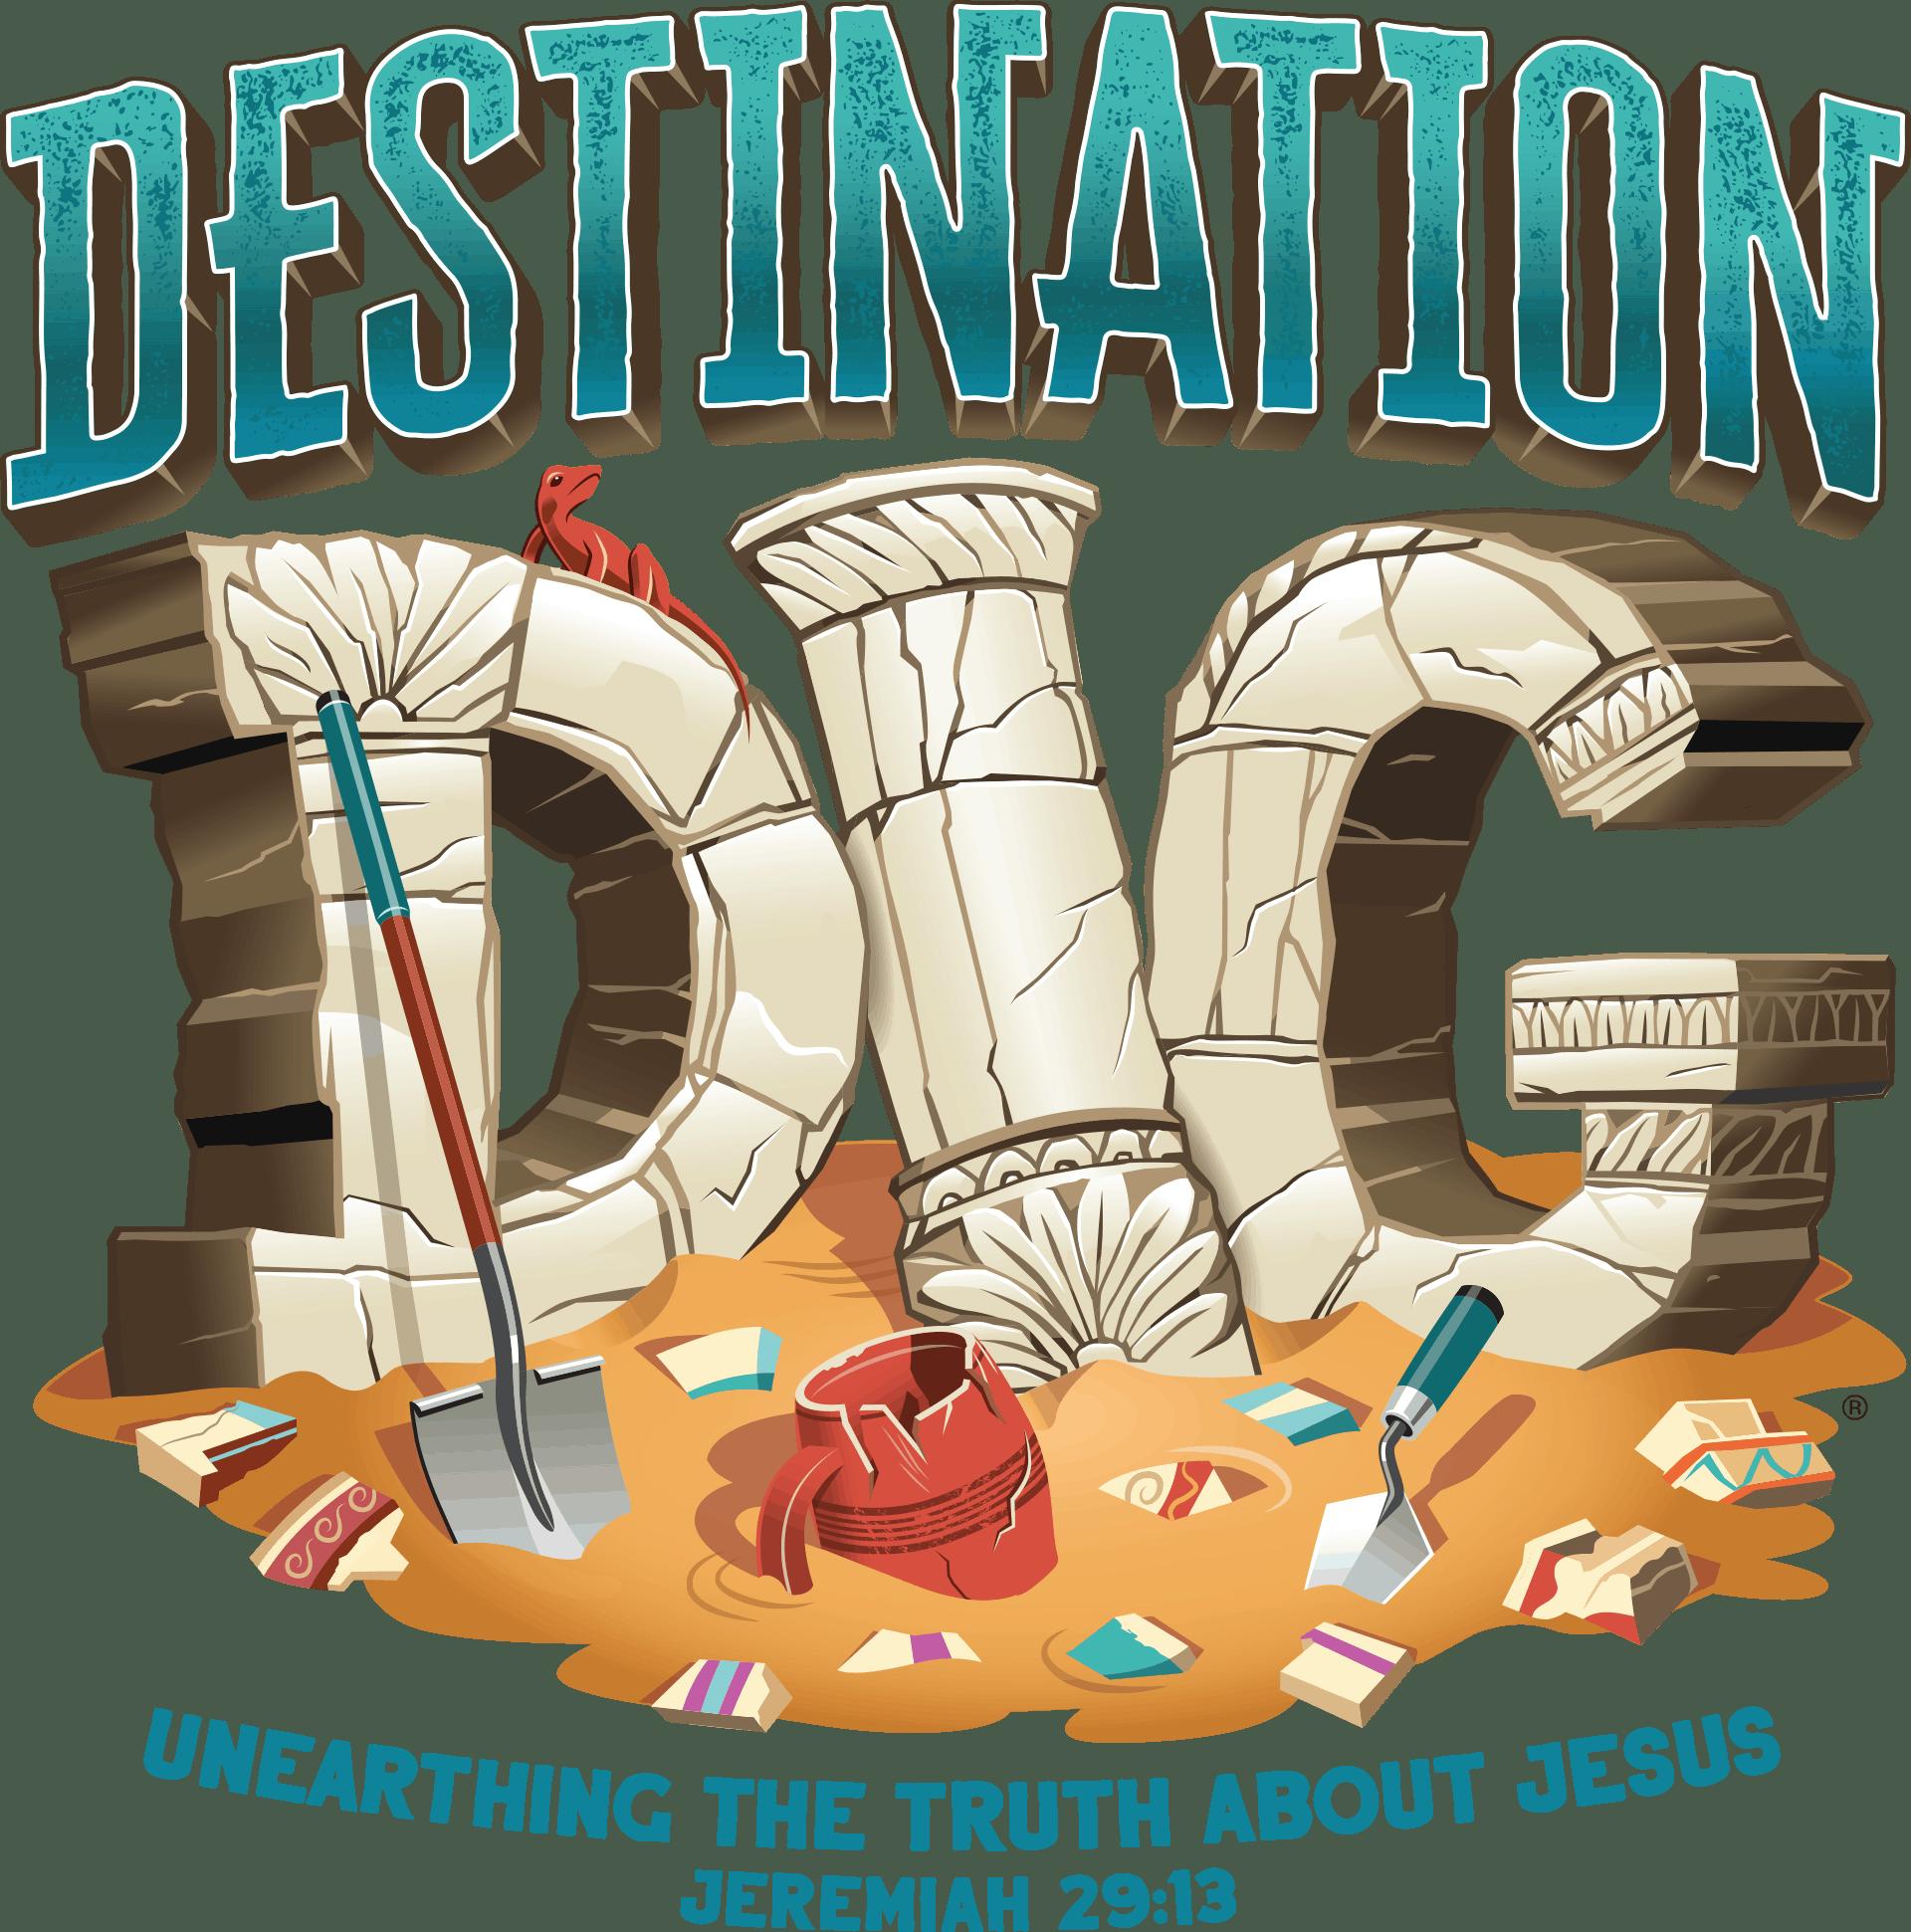 VBS-2021-Logo-Hoffmantown-Church-Destination-Dig